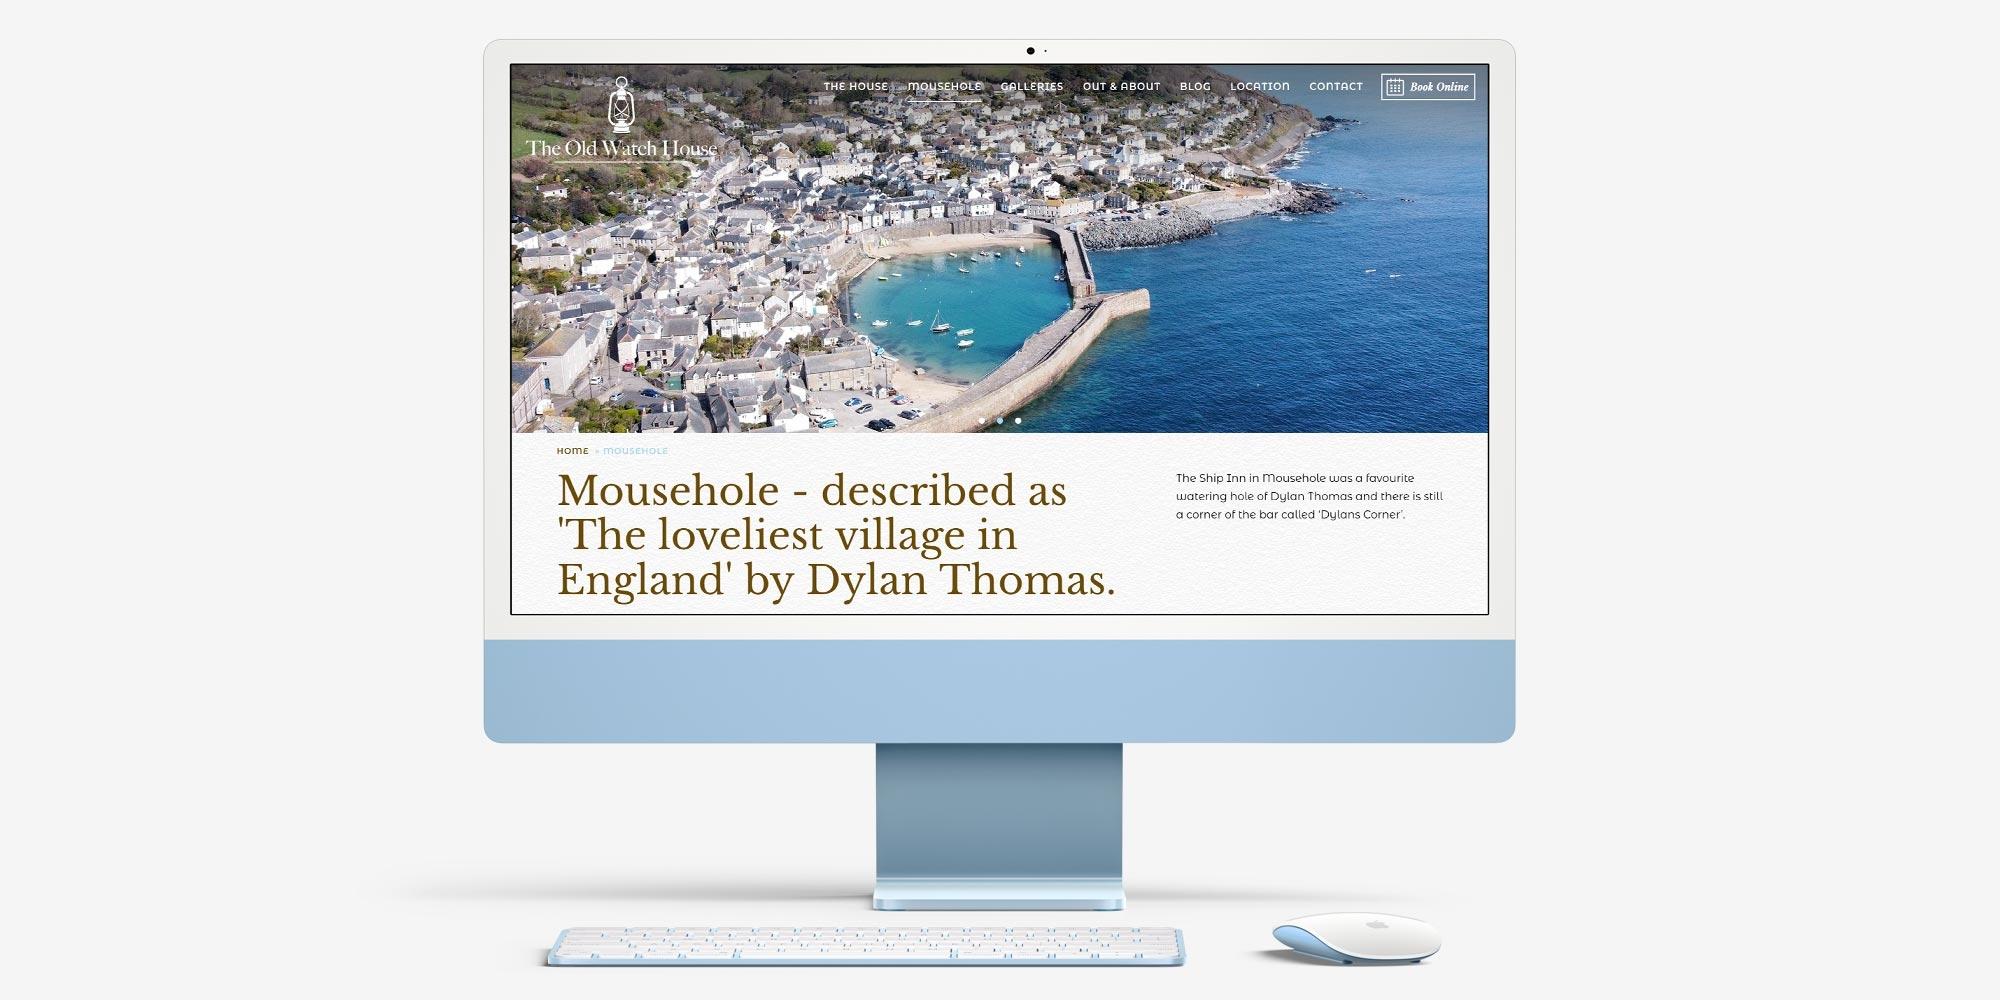 Old Watch House Website Design on a Desktop